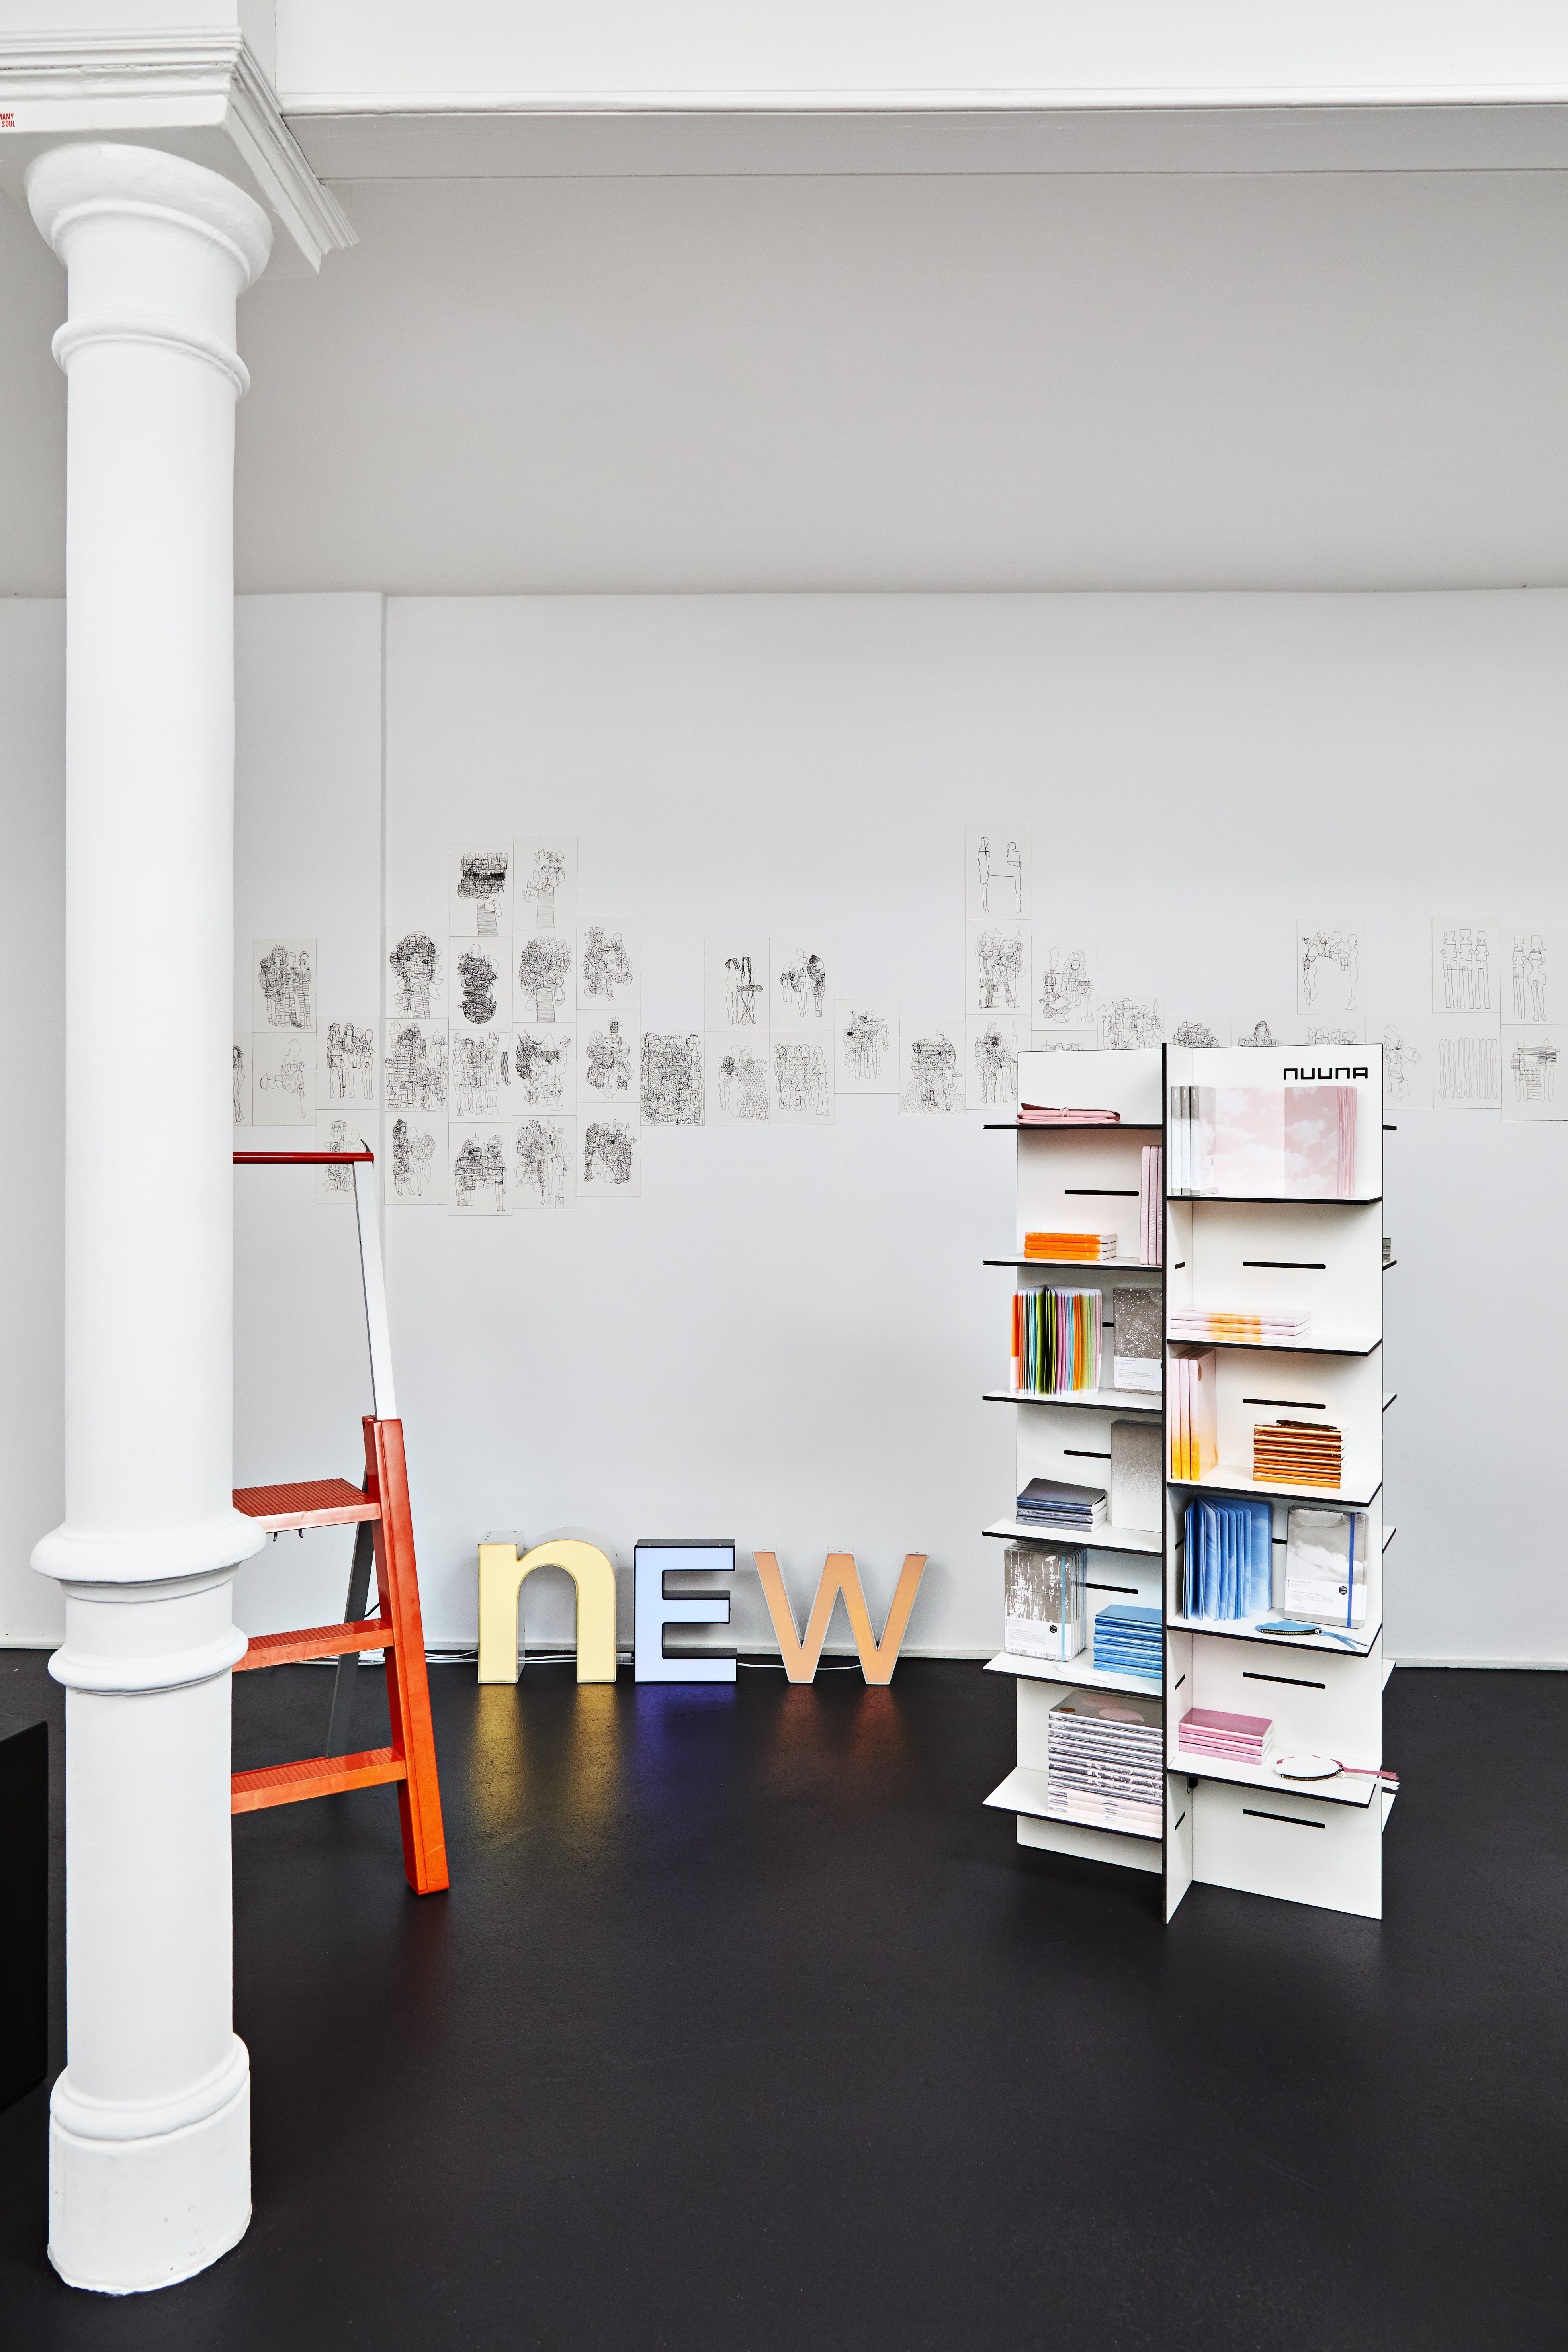 nuuna_notebooks_store_frankfurt.jpg